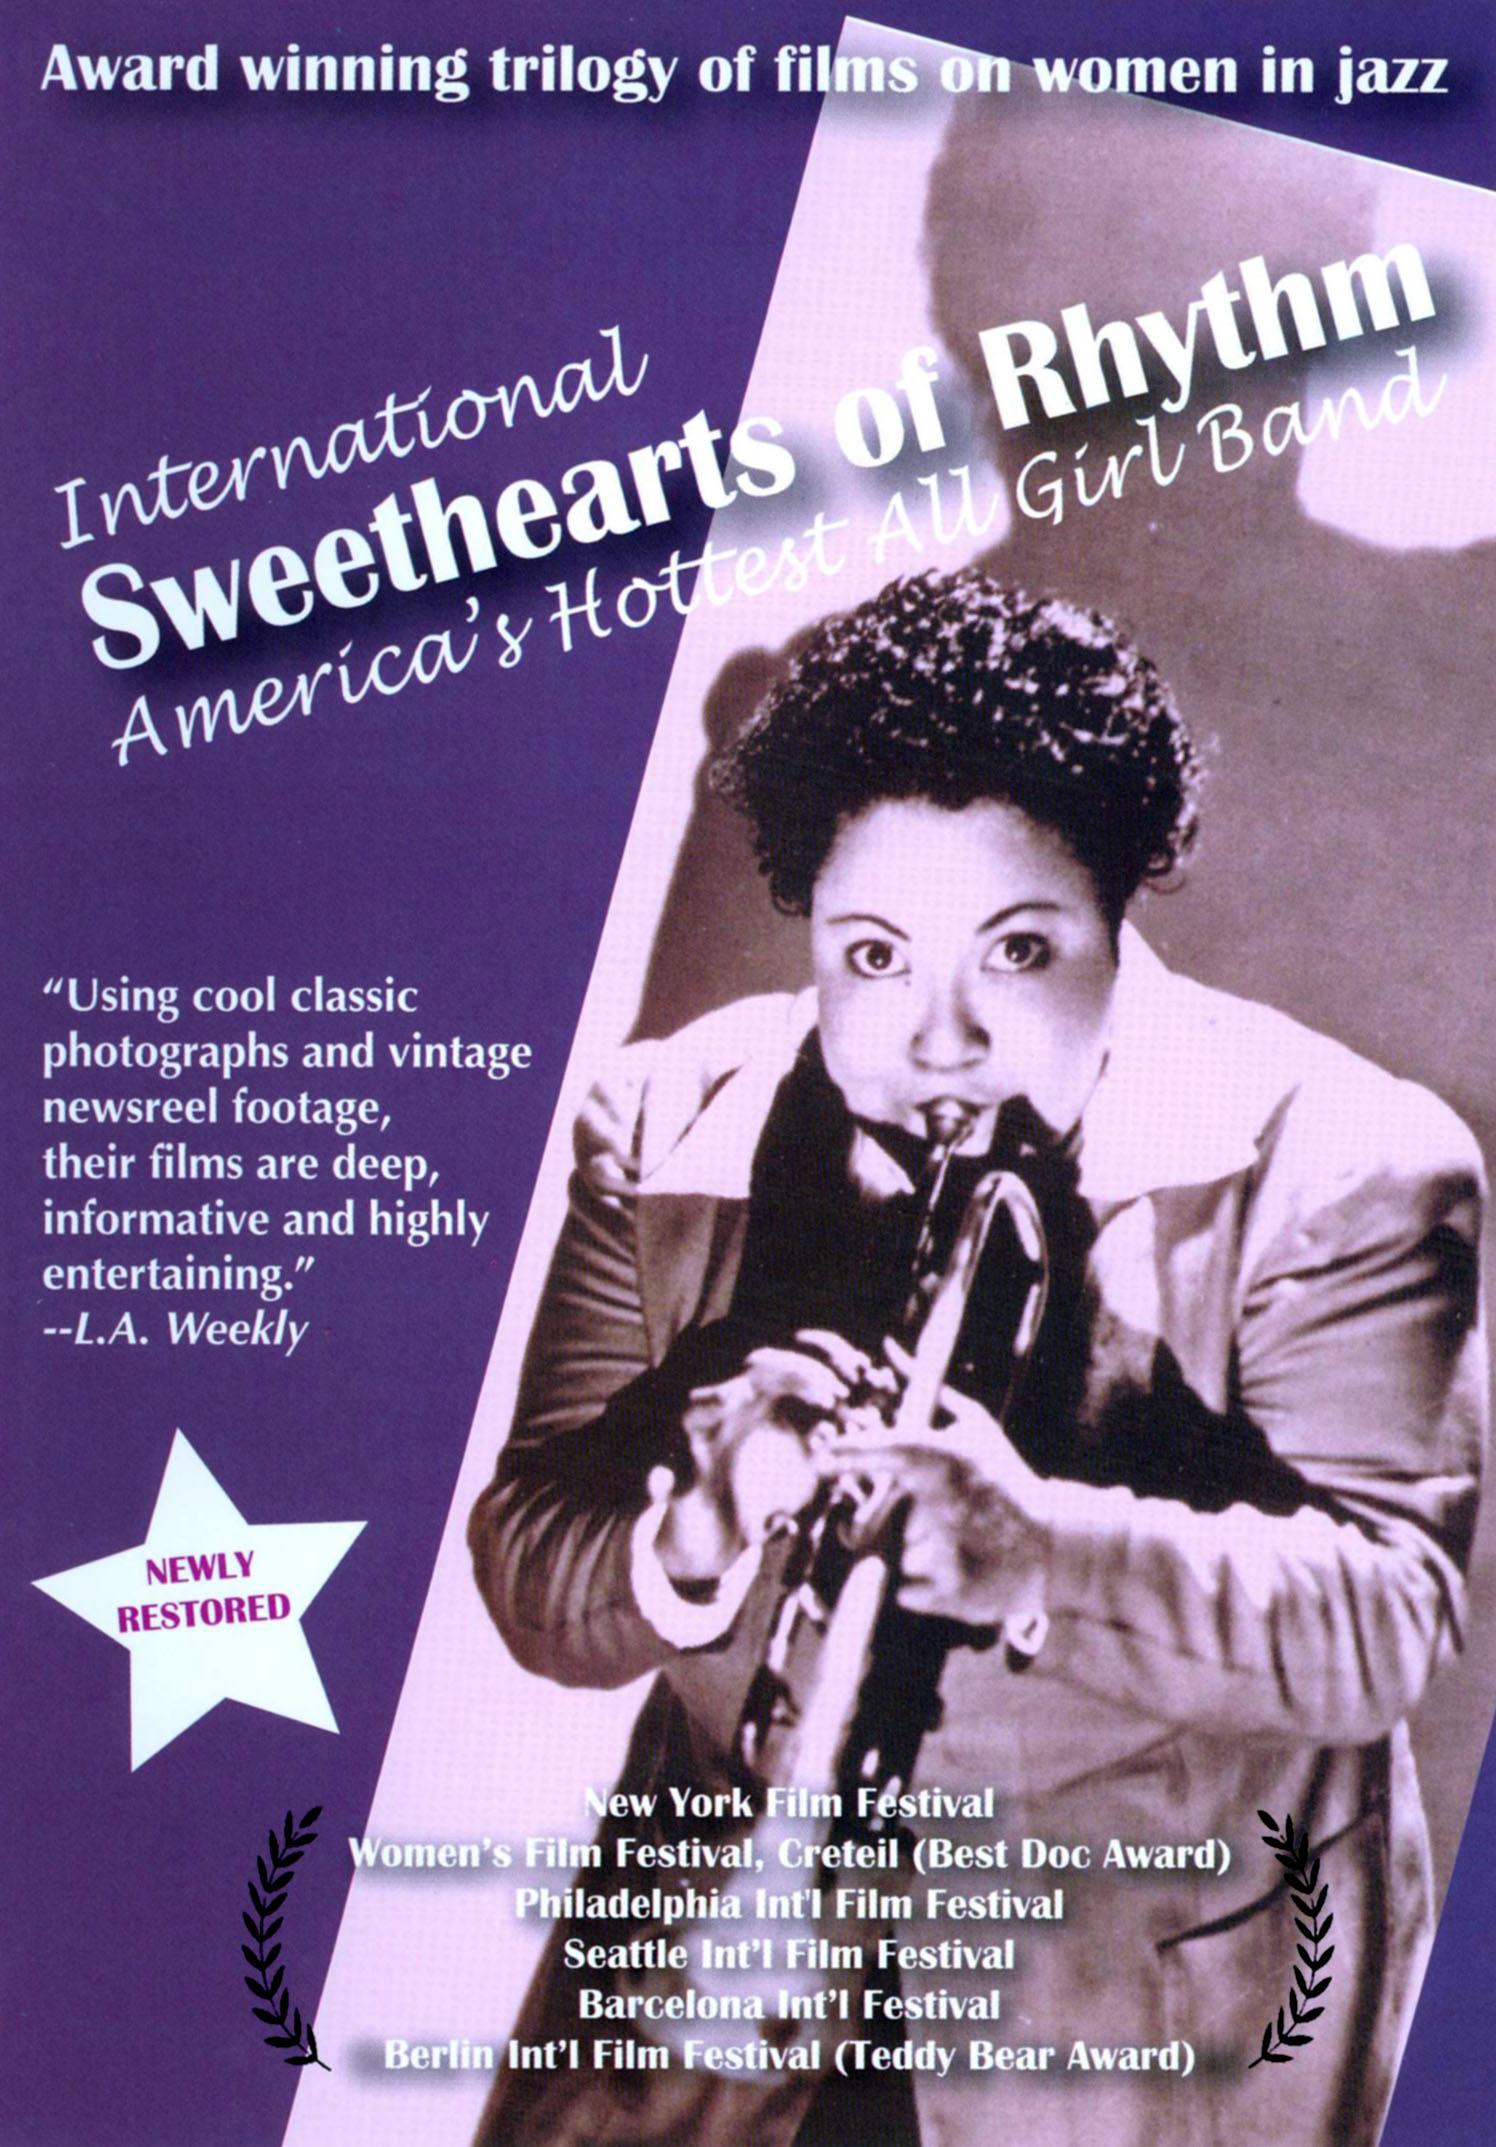 International Sweethearts of Rhythm: America's Hottest Girl Band